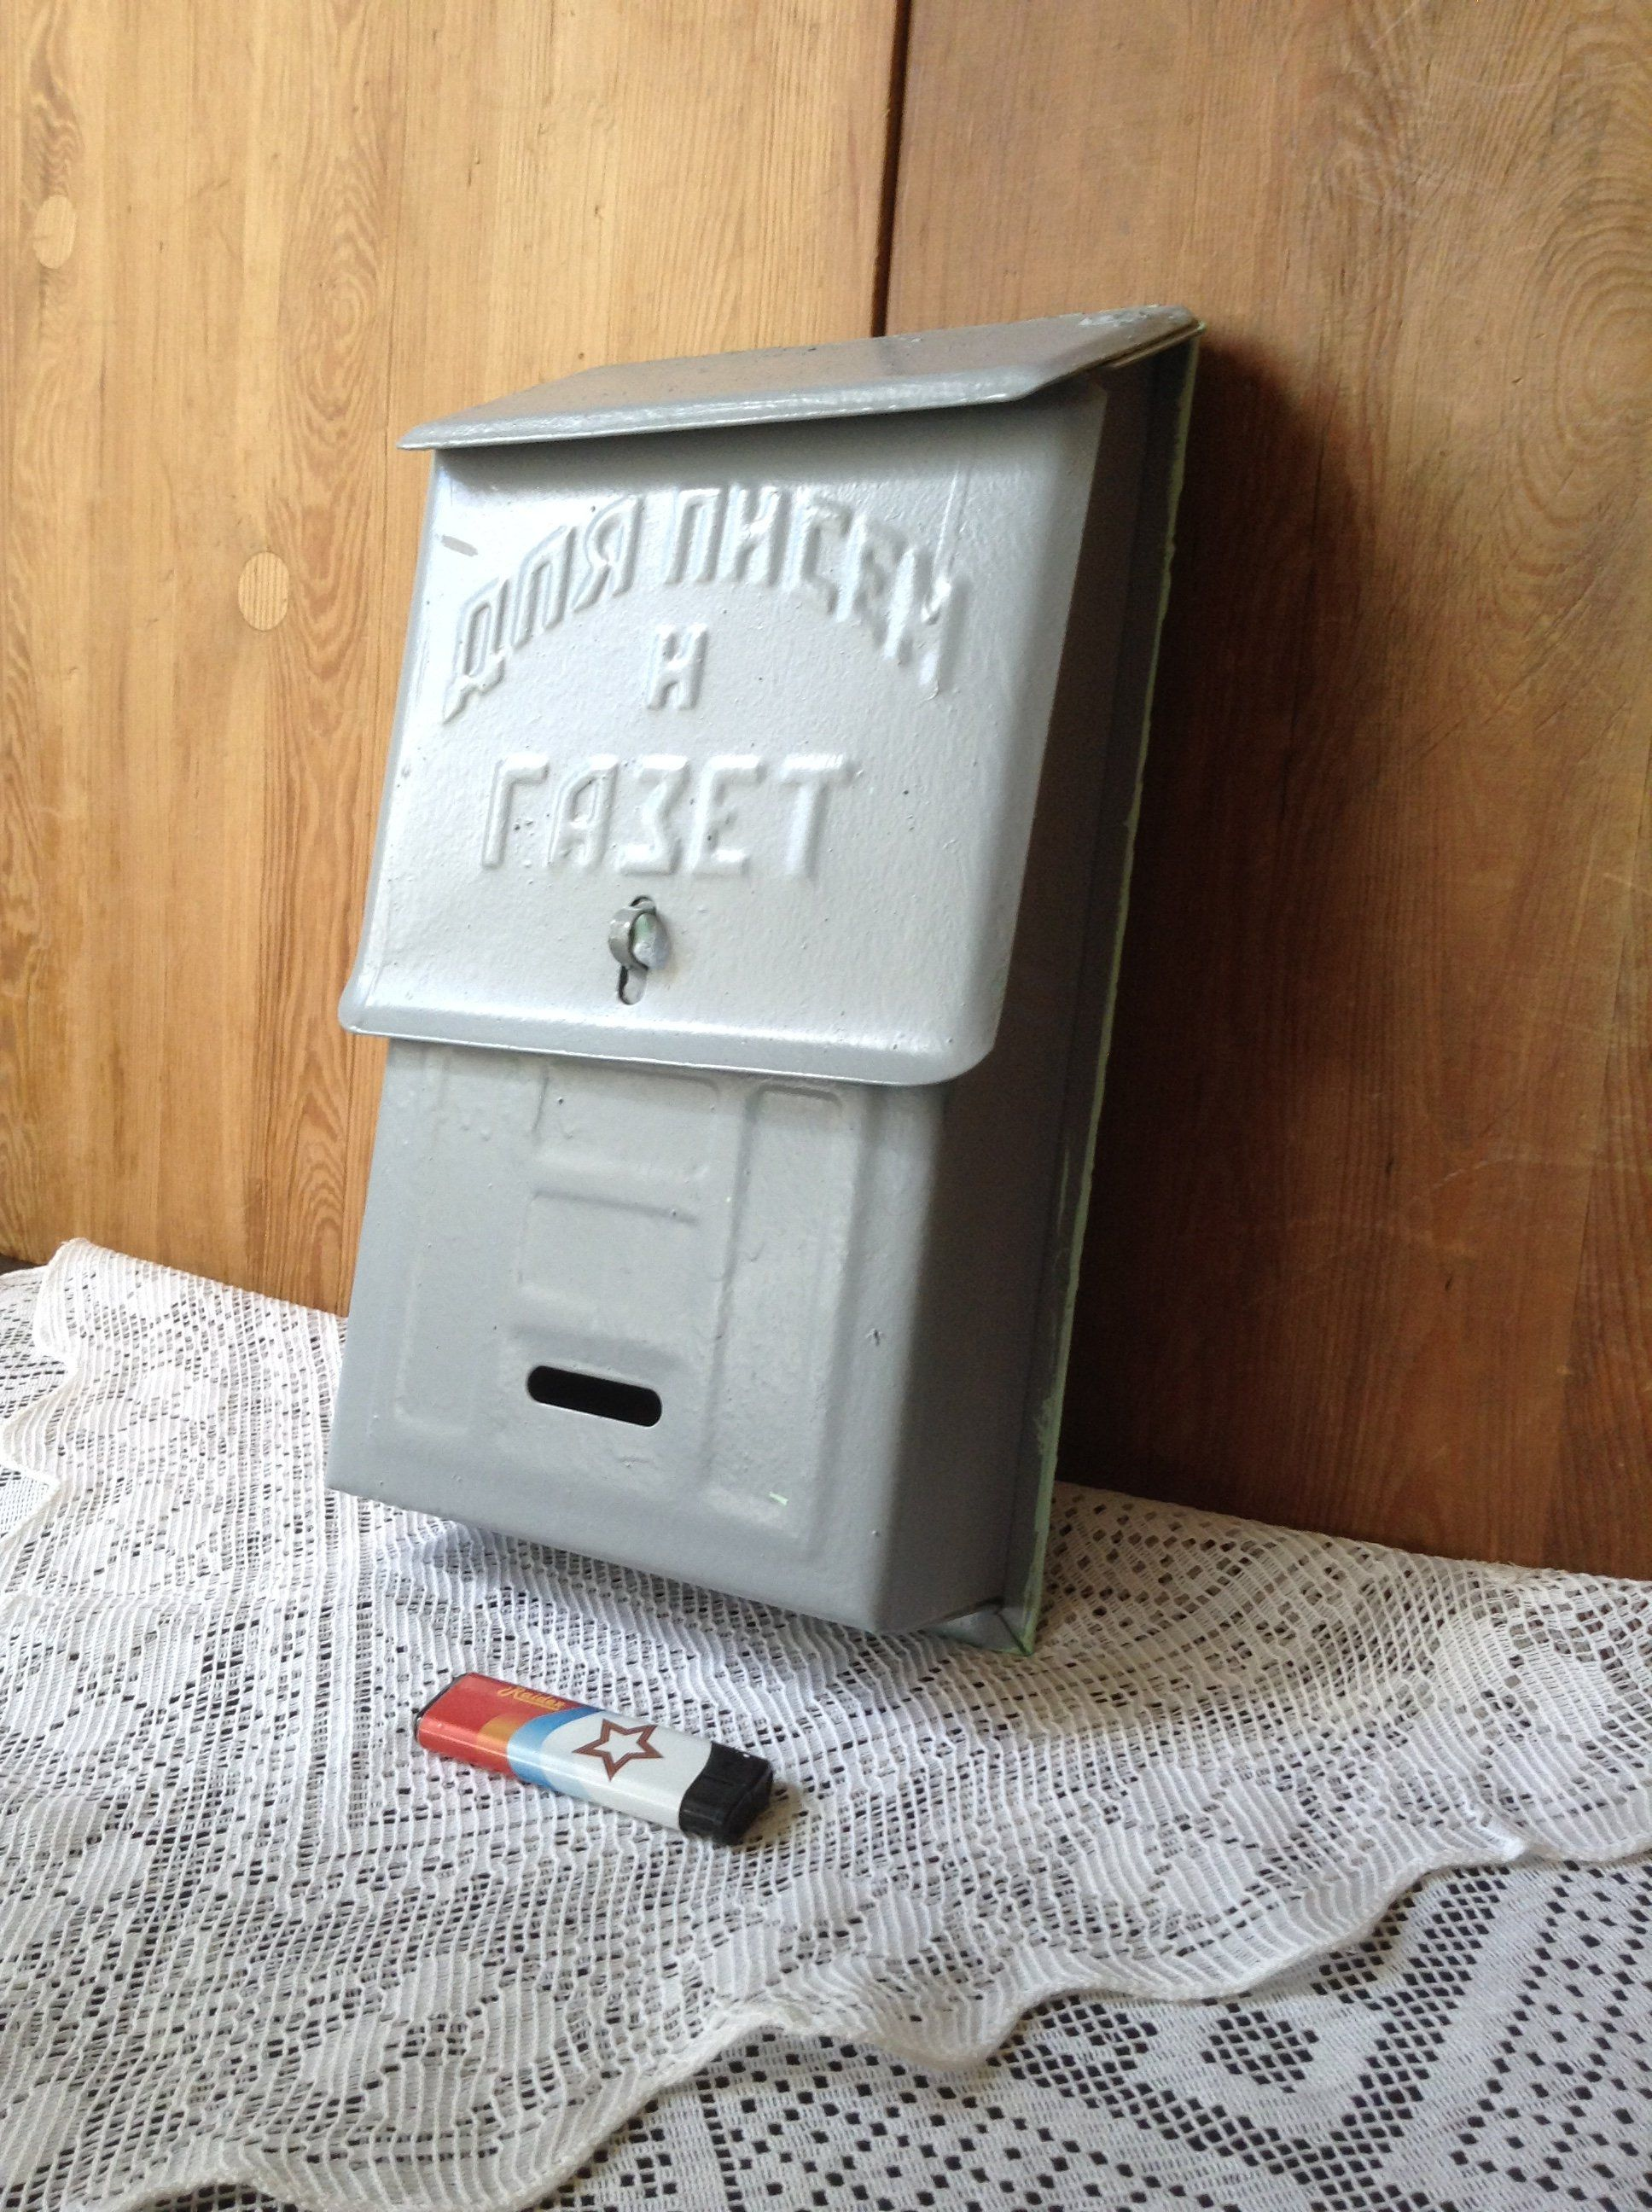 Soviet Vintage Mailbox Primitive Original Retro Mailbox Locking Old Letterbox Light Gray Metal Chest Rustic Storage Box Wedding Decor